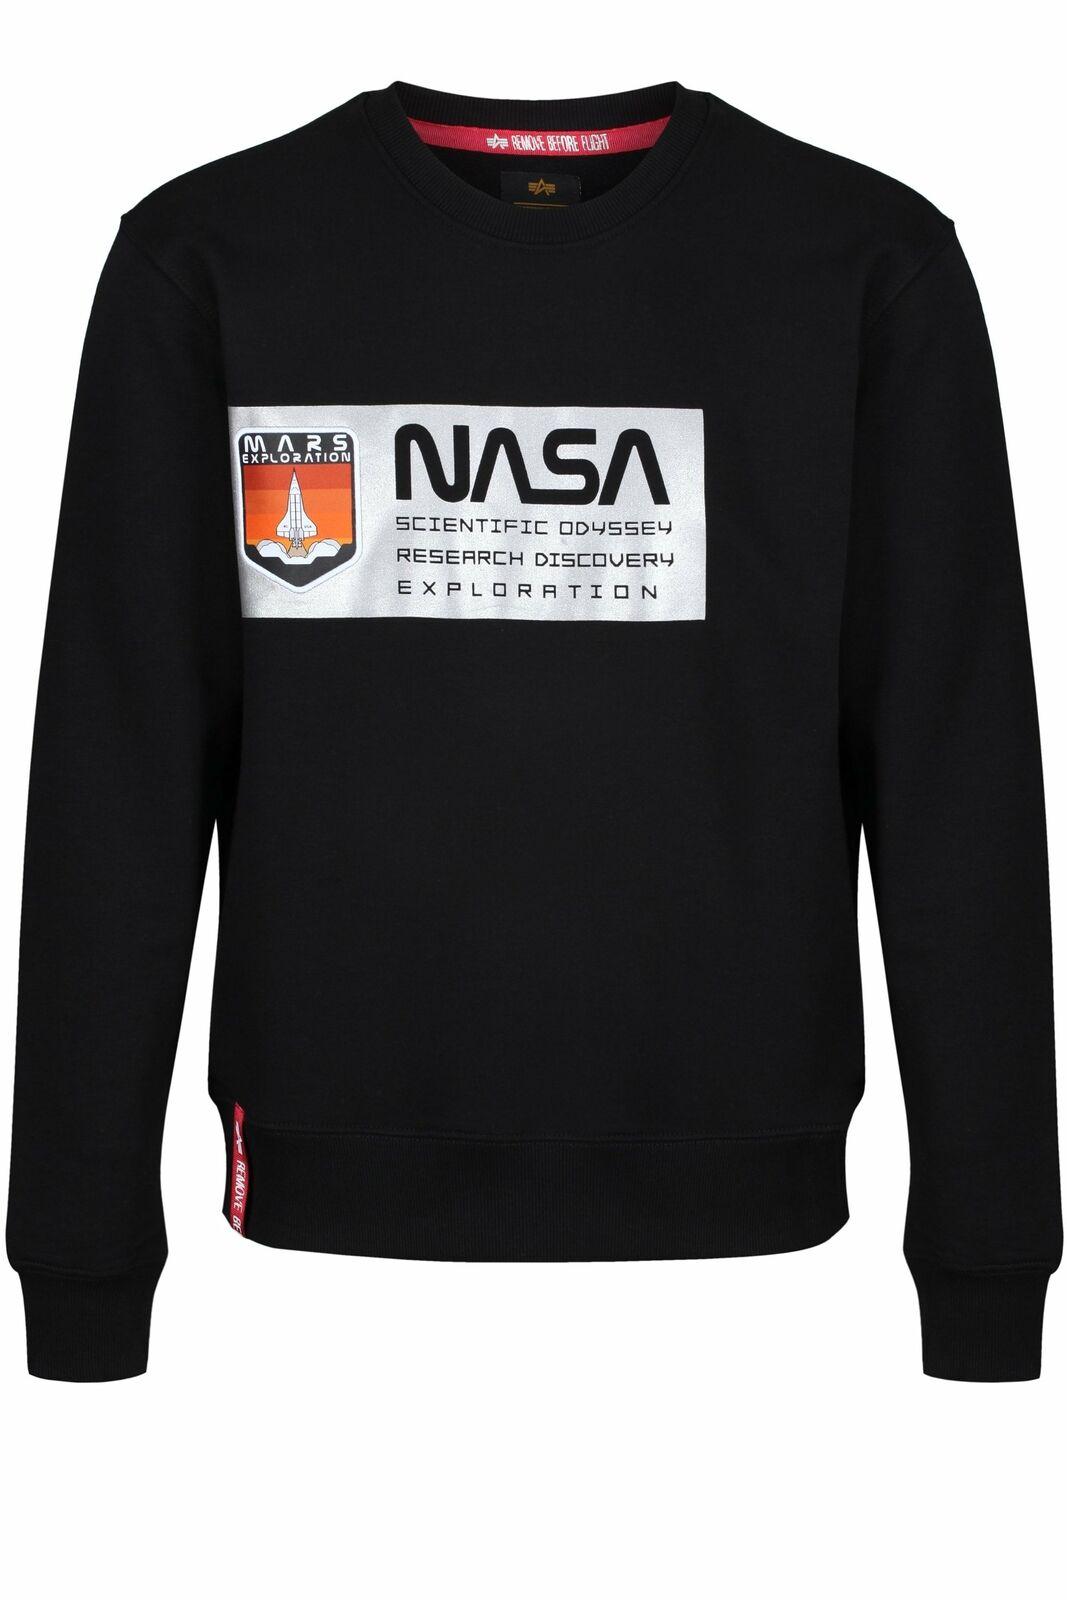 Limited Edition ALPHA INDUSTRIES Mars Reflective Sweatshirt | Black